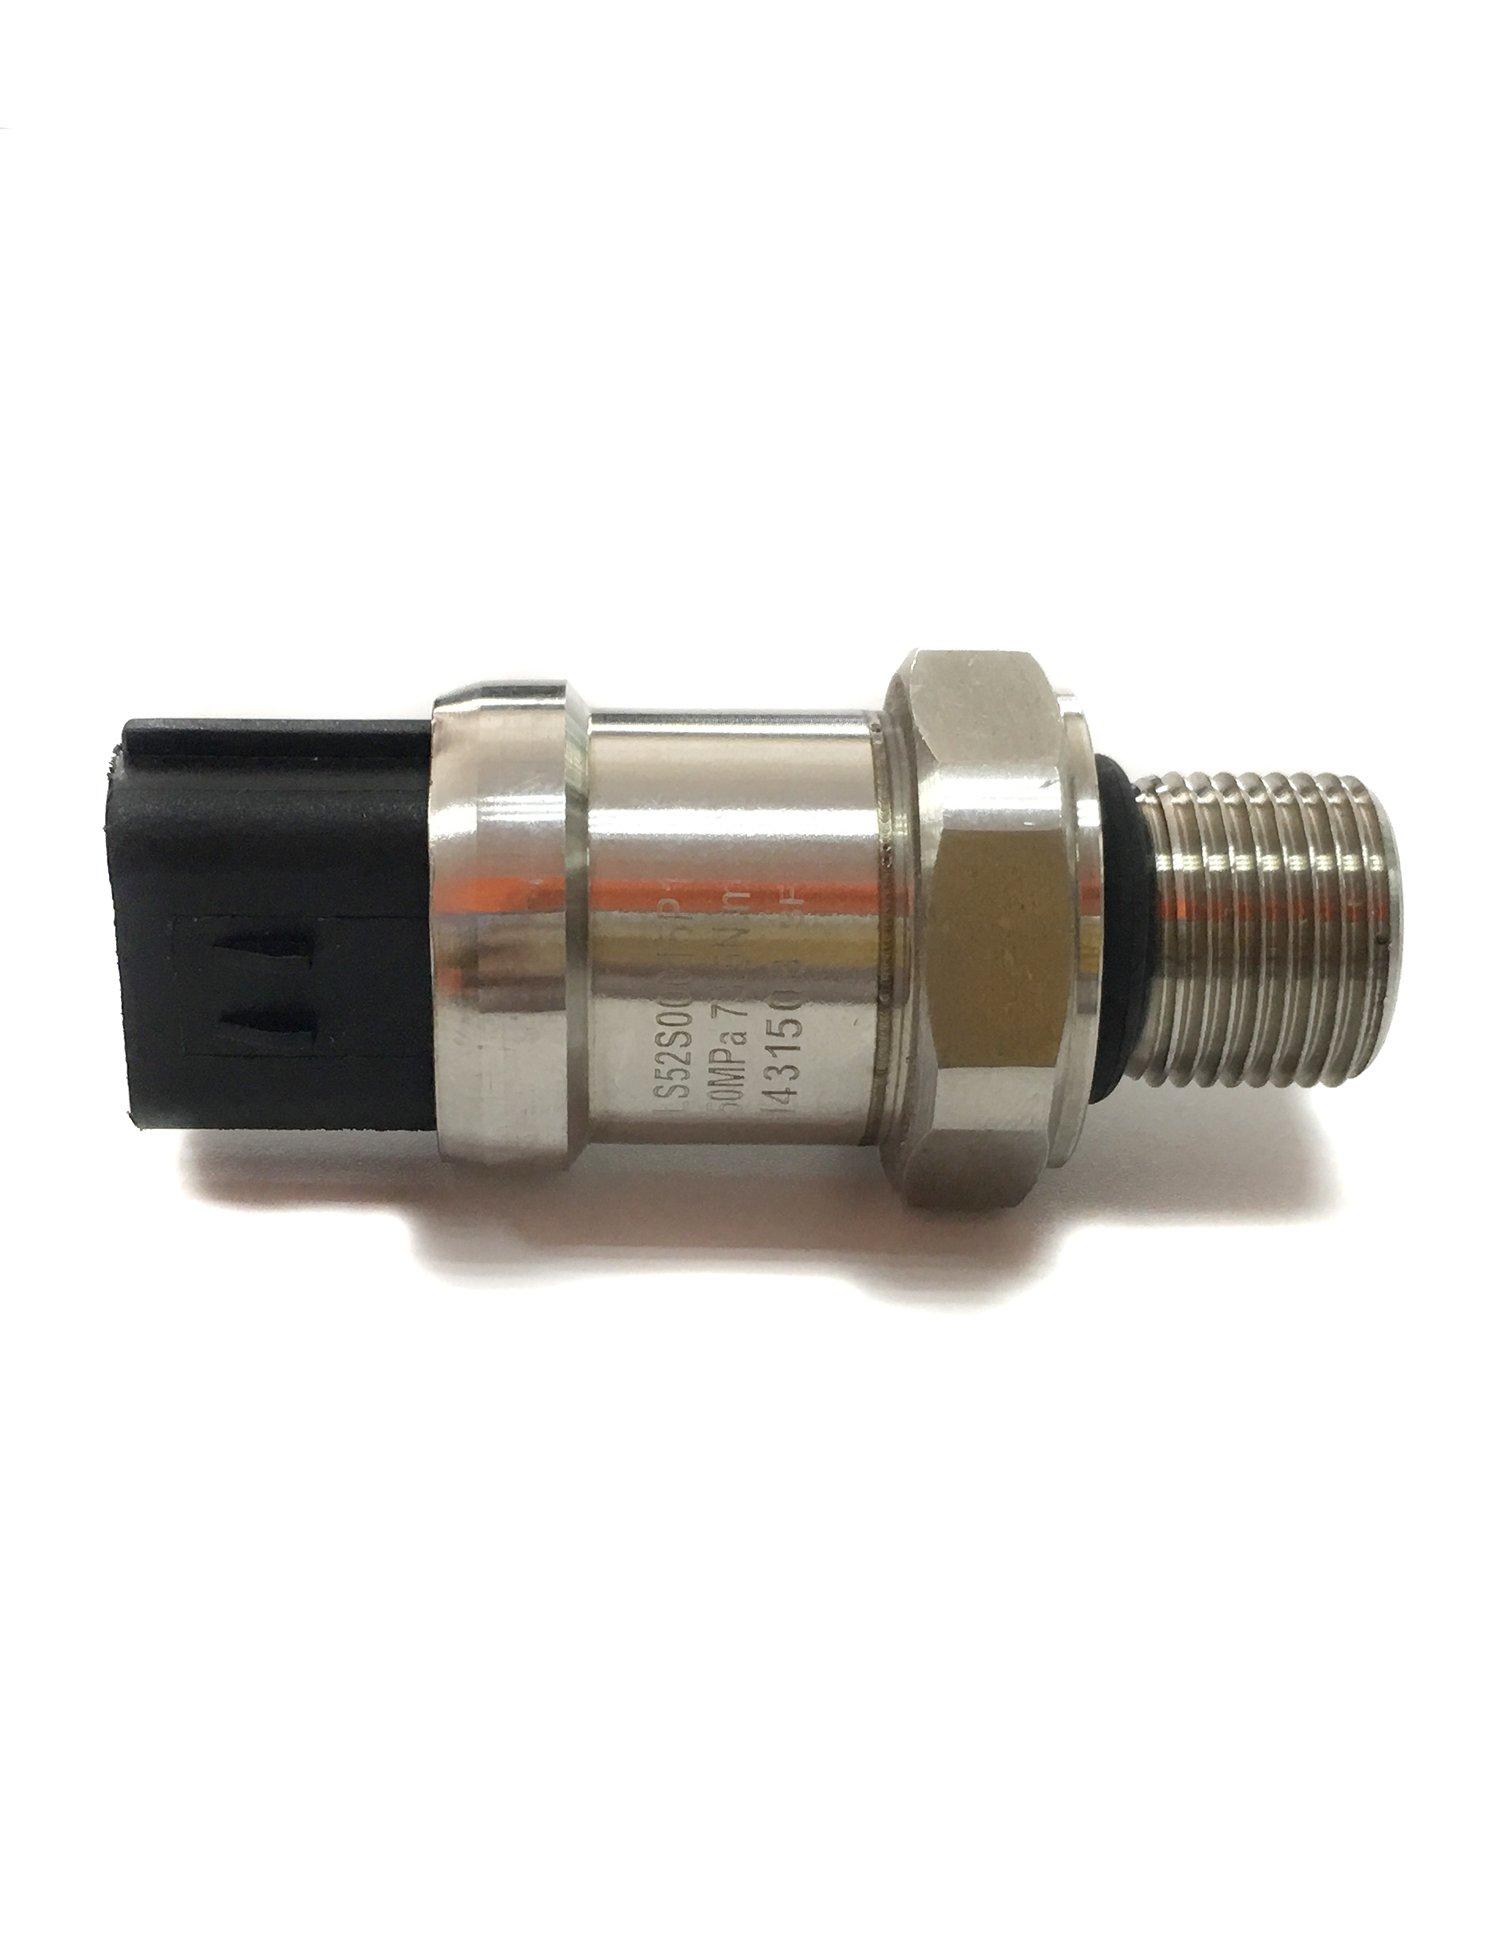 50MPa High Pressure Sensor LS52S00015P1 for Kobelco Excavator SK200-8